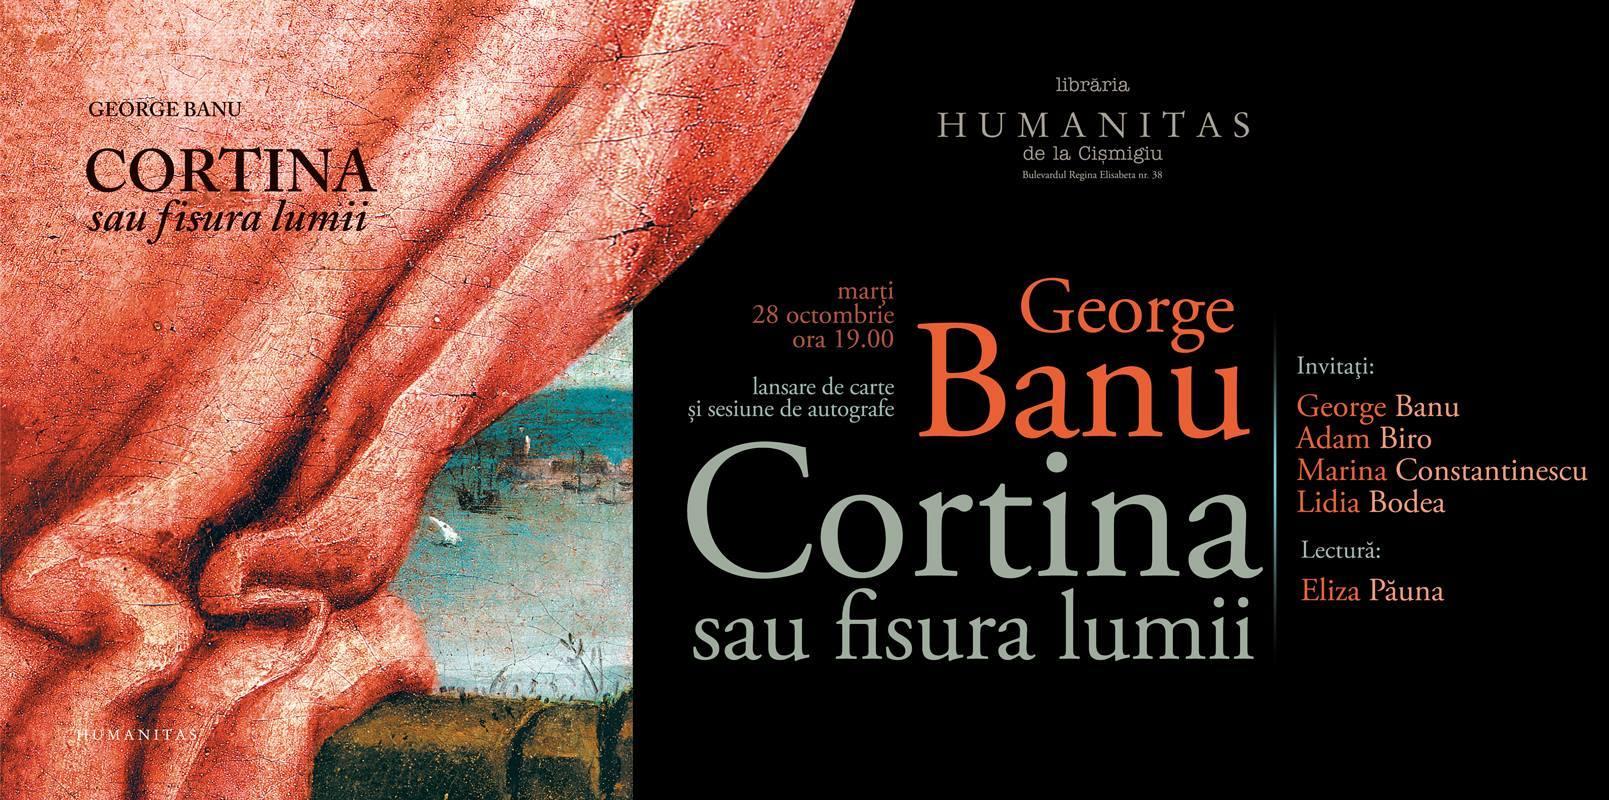 Eveniment George Banu la Librăria Humanitas de la Cişmigiu